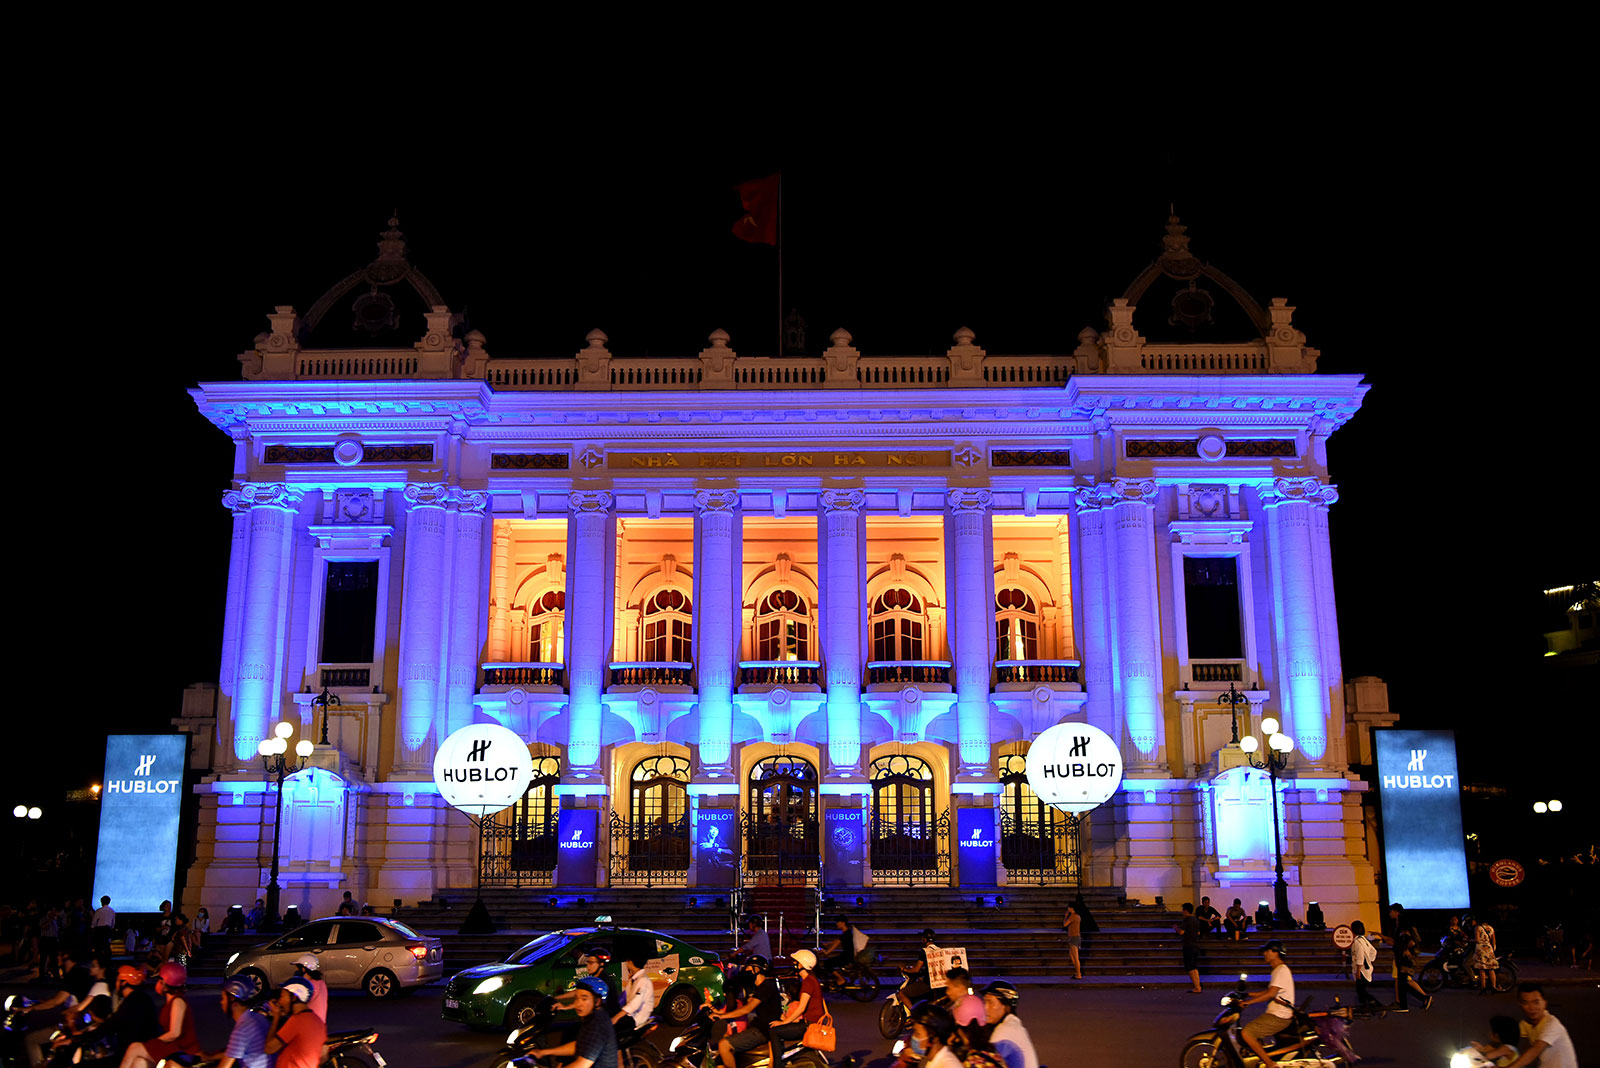 Hublot Hanoi Opera House 1